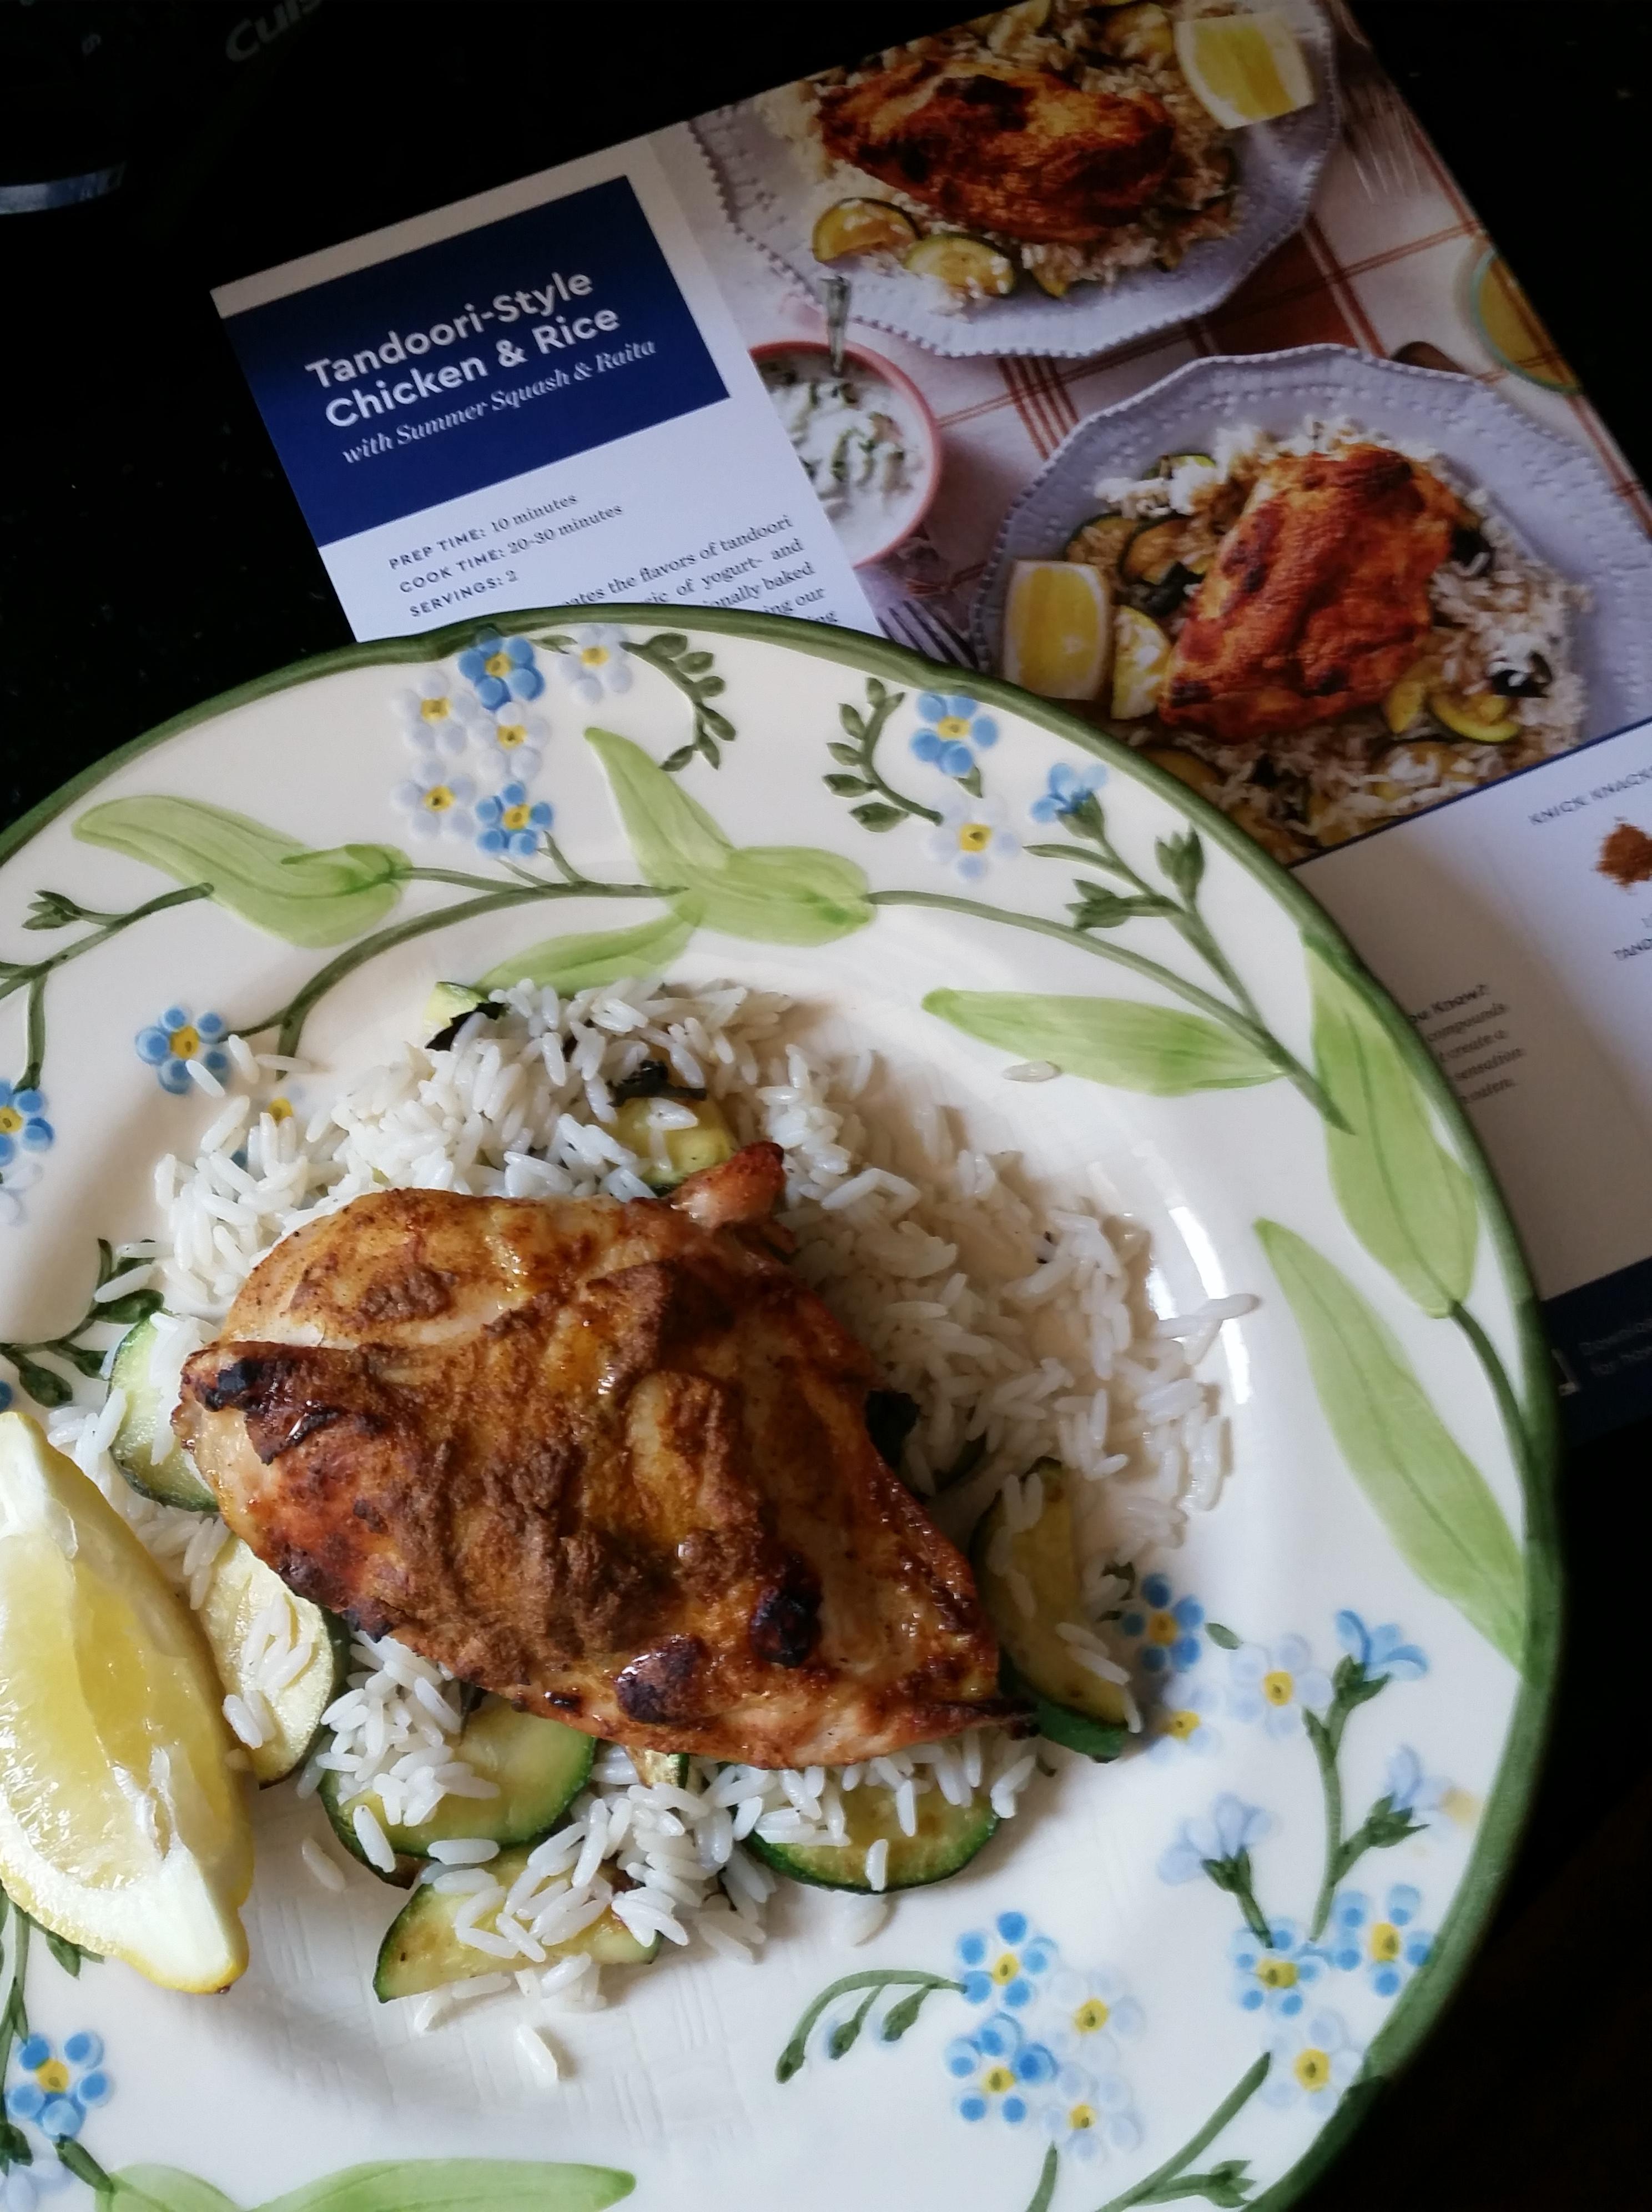 Blue apron unhealthy - To Blue Apron Or Not To Blue Apron Part Three Kate Mahar Writes